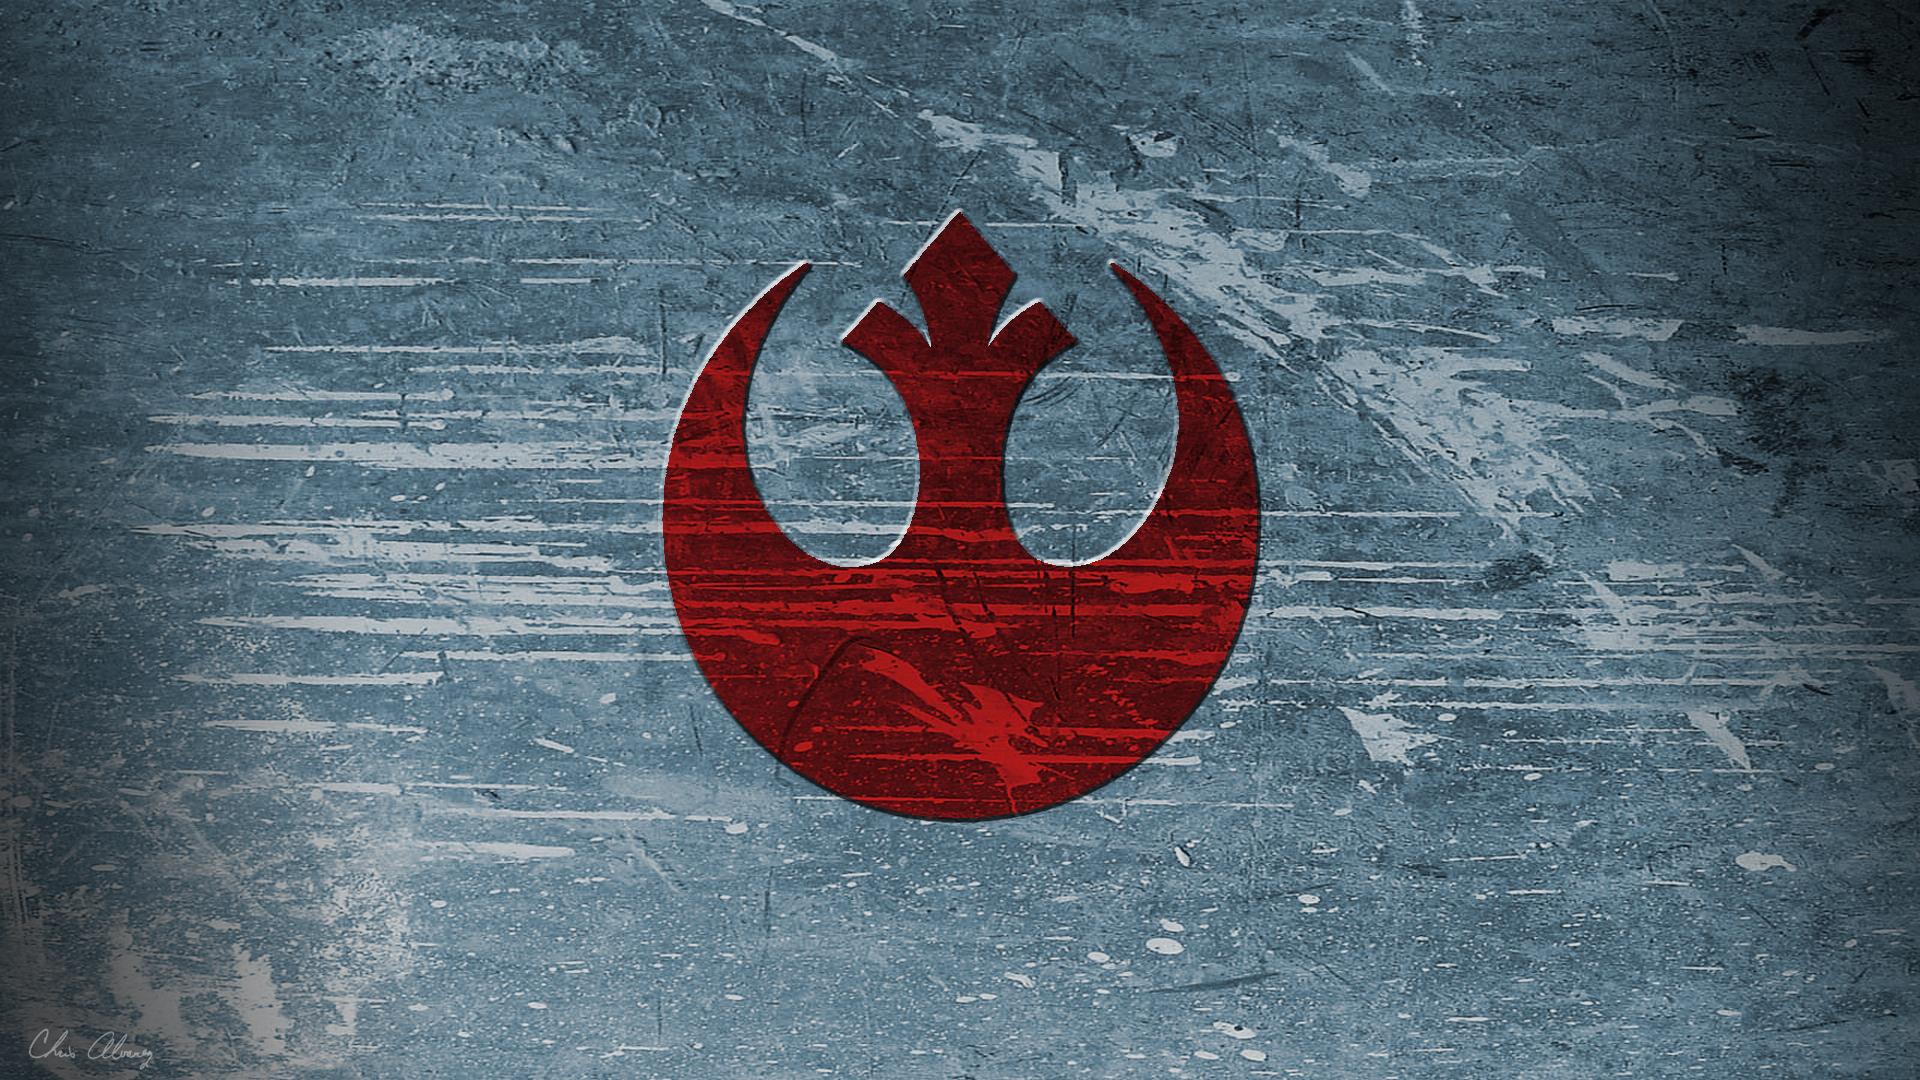 Rebel alliance symbol http://imgs.steps.dragoart.com/how ... |Cool Rebellion Symbol